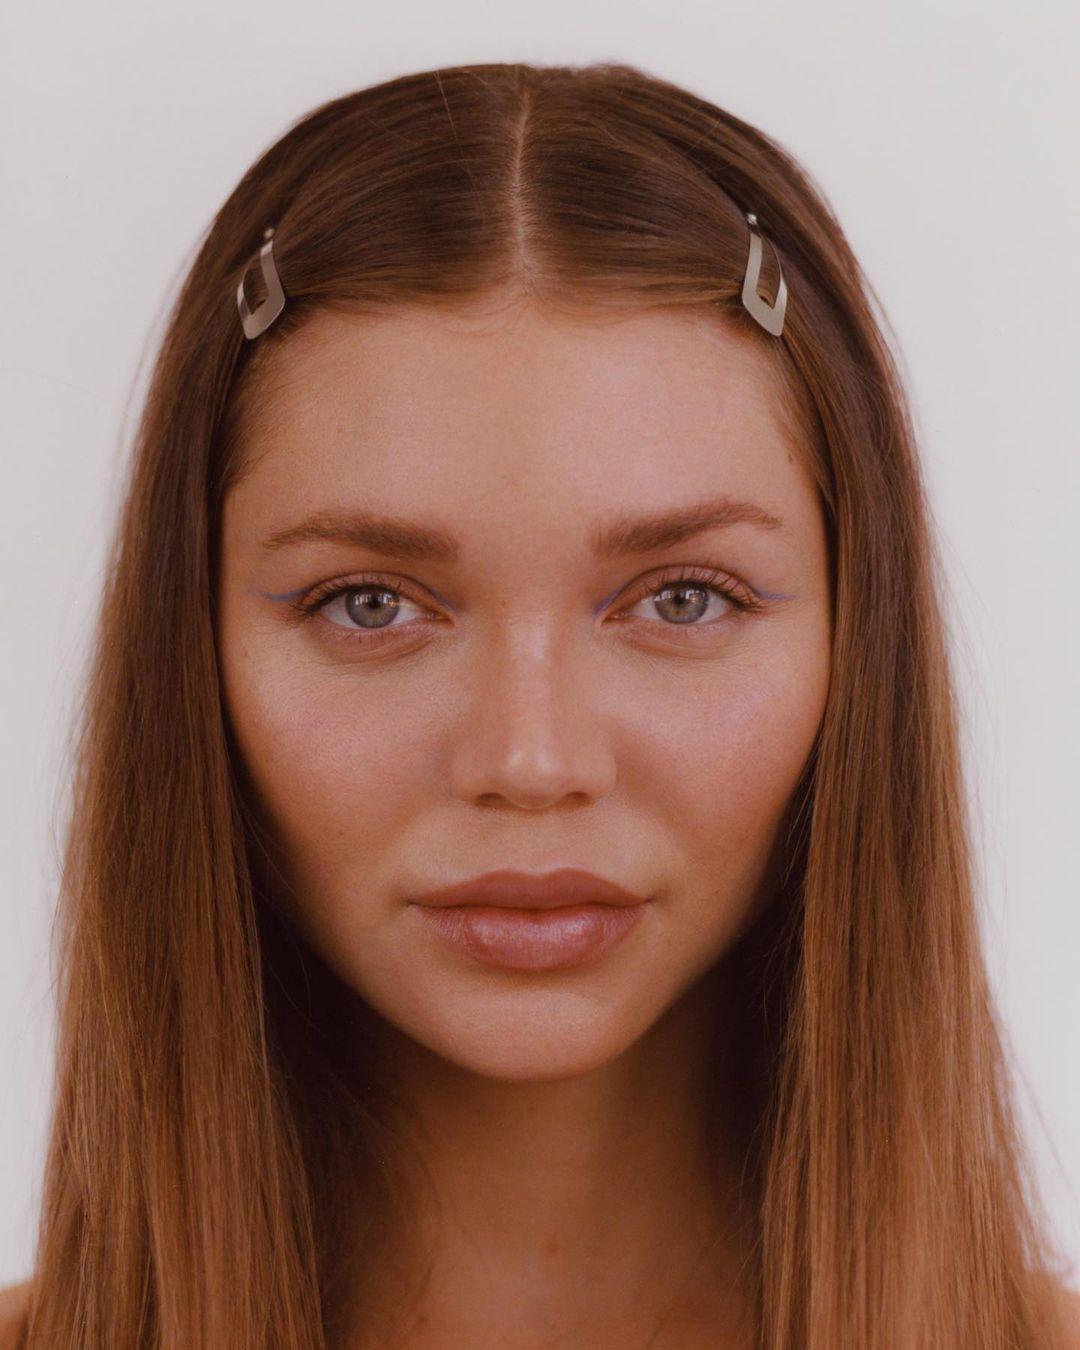 Jessie-Andrews-Wallpapers-Insta-Fit-Bio-5